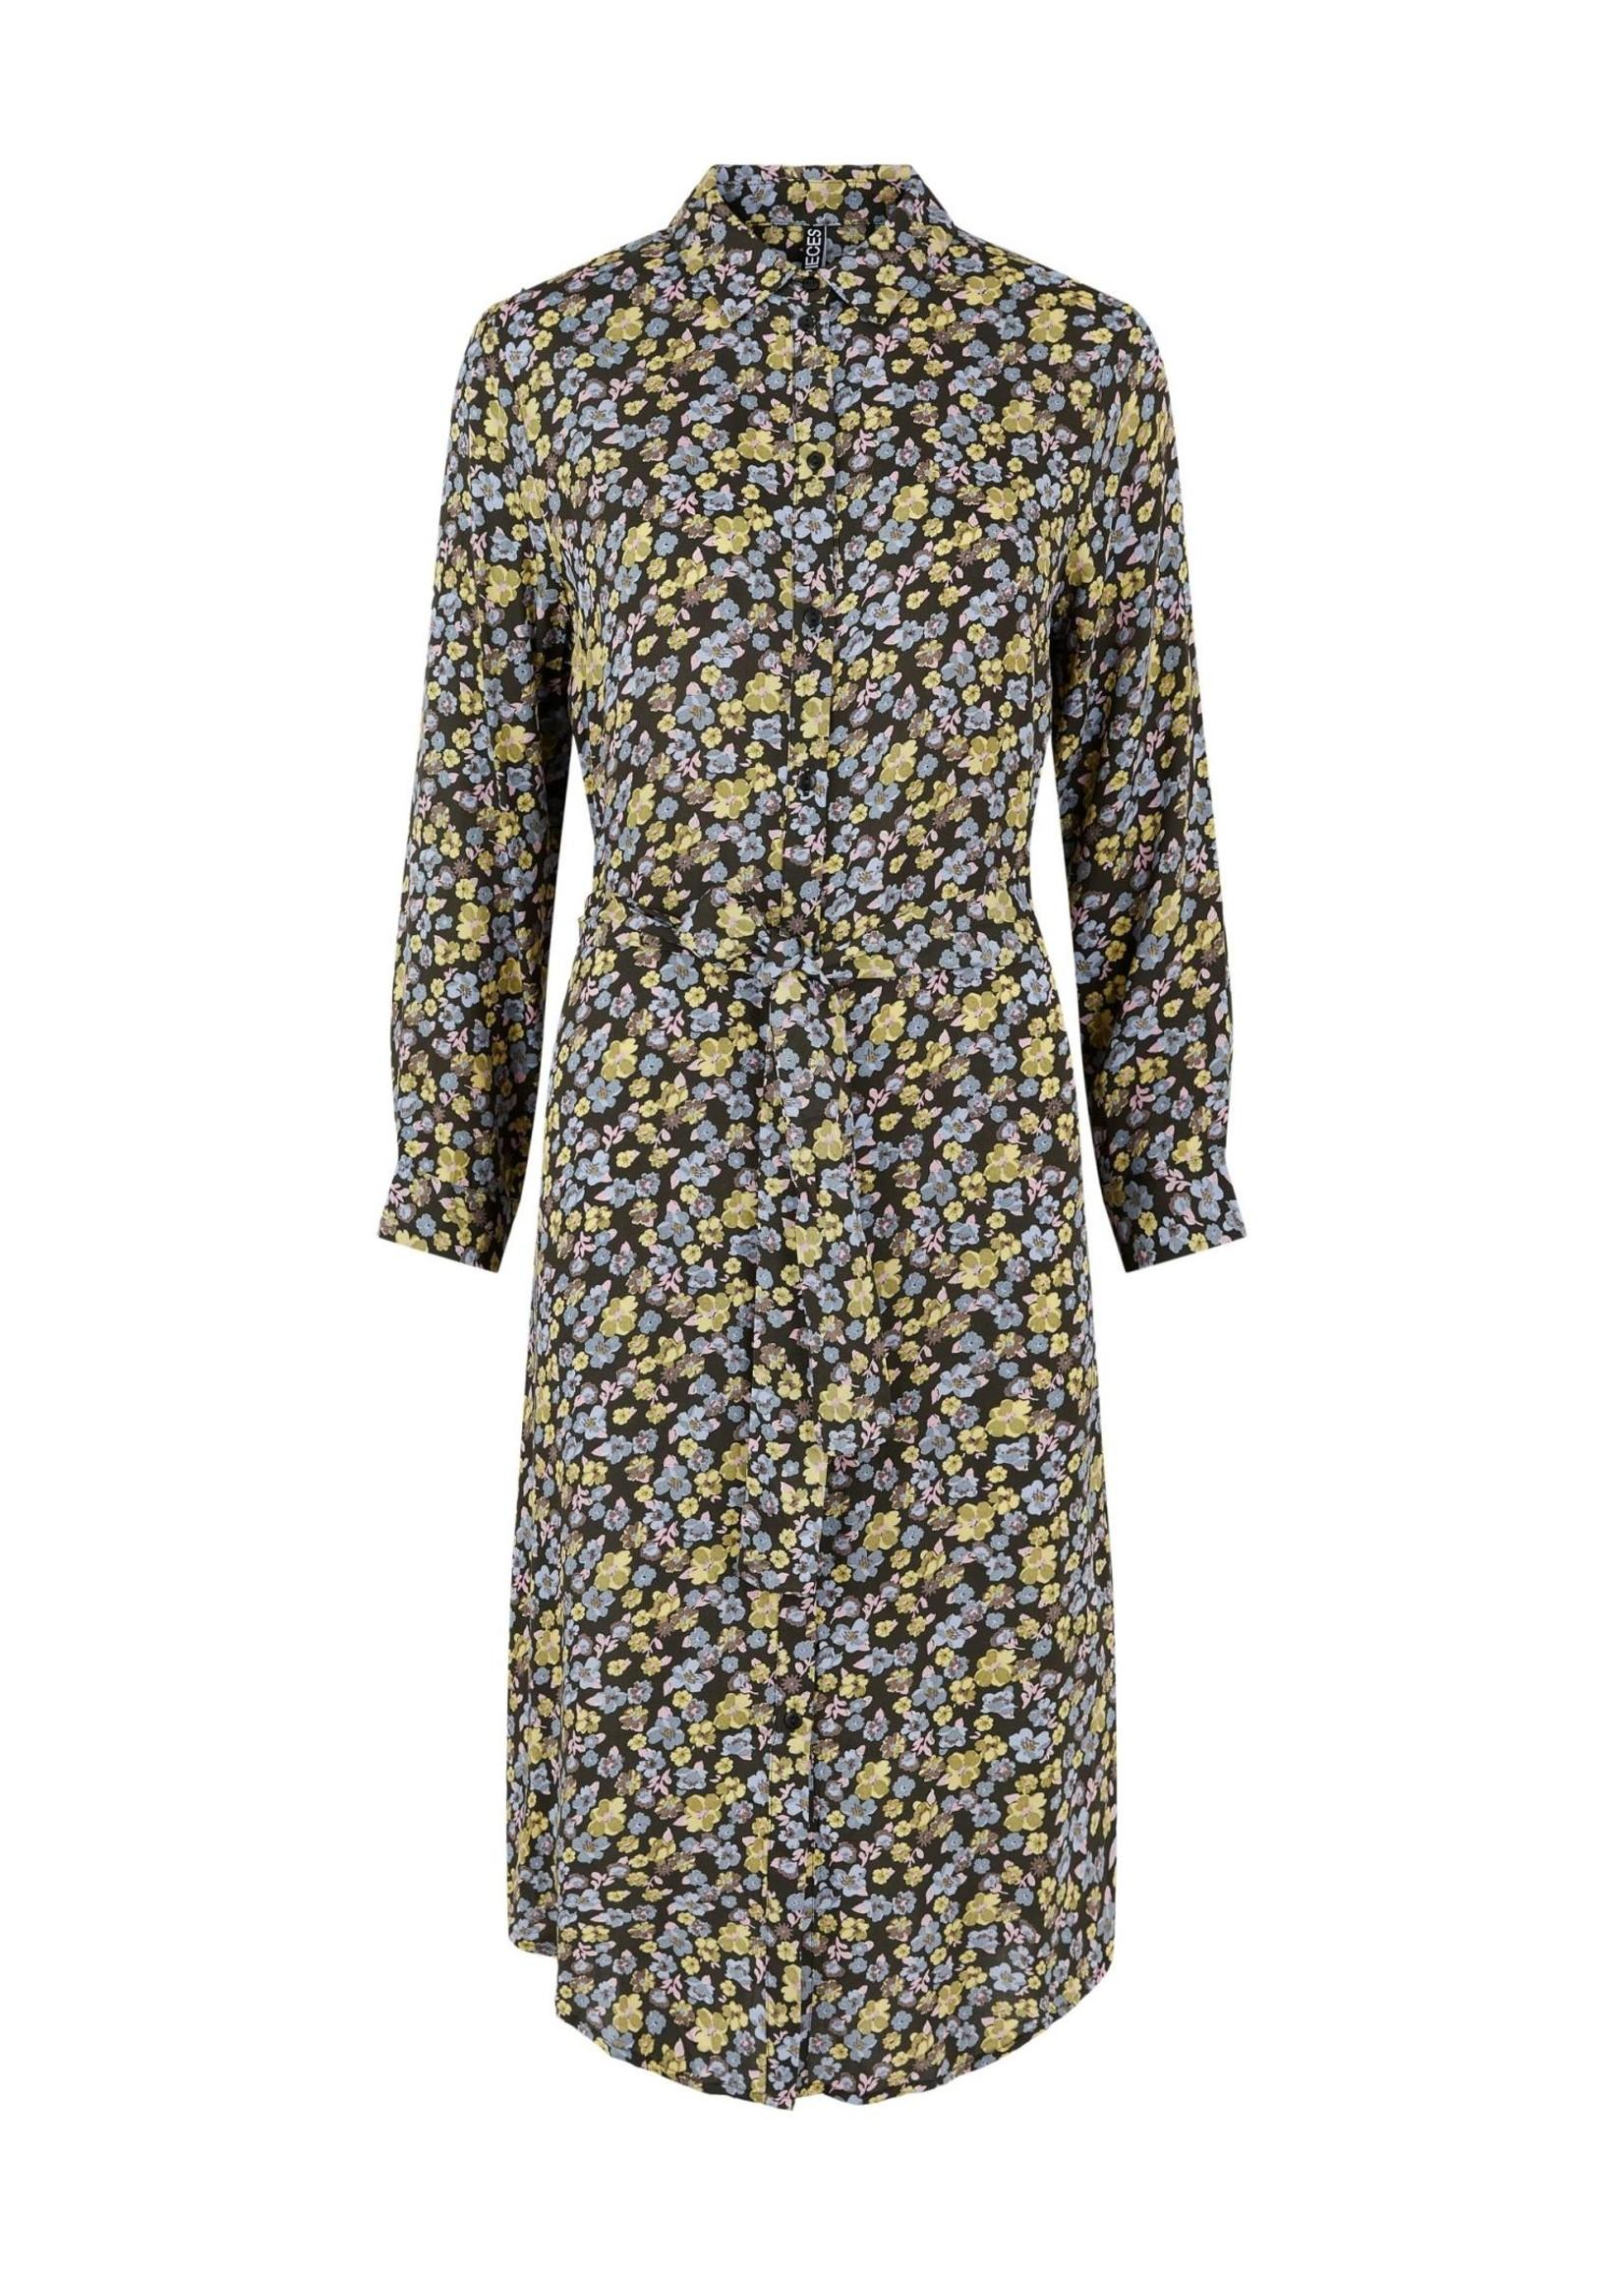 PIECES ELLIA 7/8 MIDI SHIRT DRESS PB BC rosin flowers